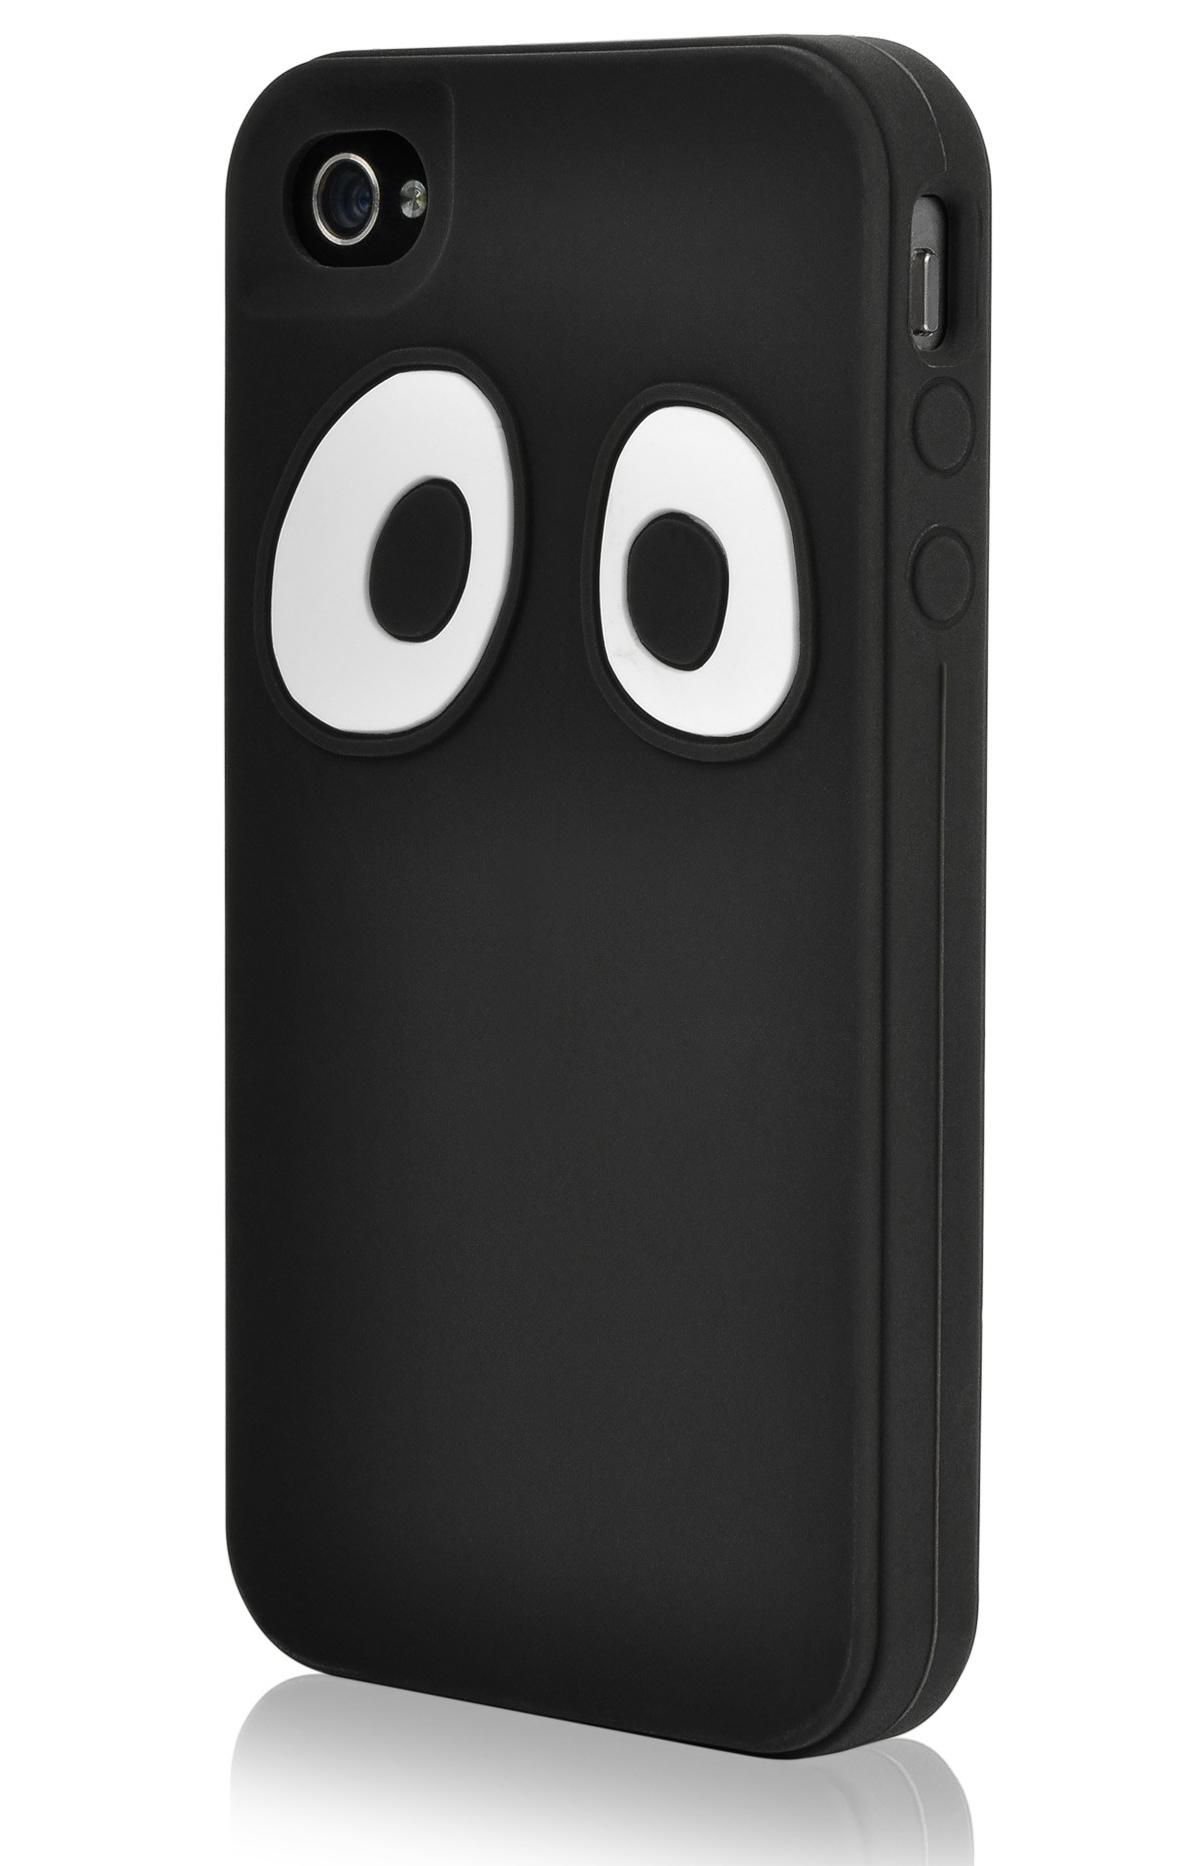 Jack Spade Googly Eyes iPhone 5 Case